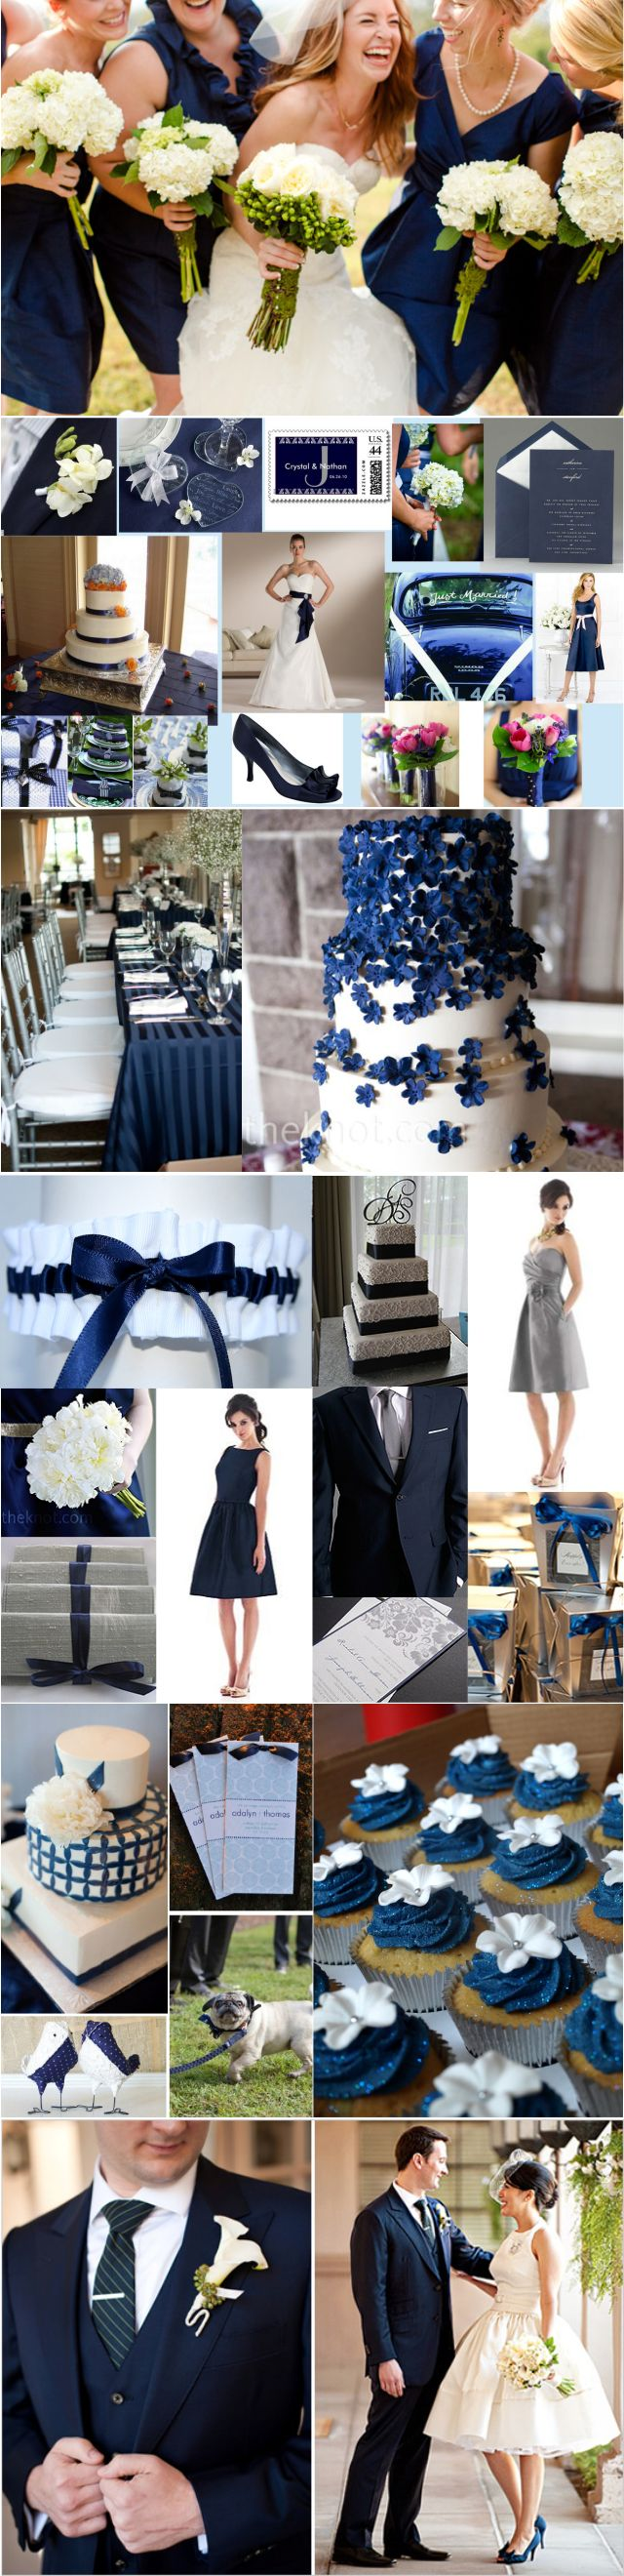 Navy wedding inspiration: Preppy and Traditional » Random Tuesdays